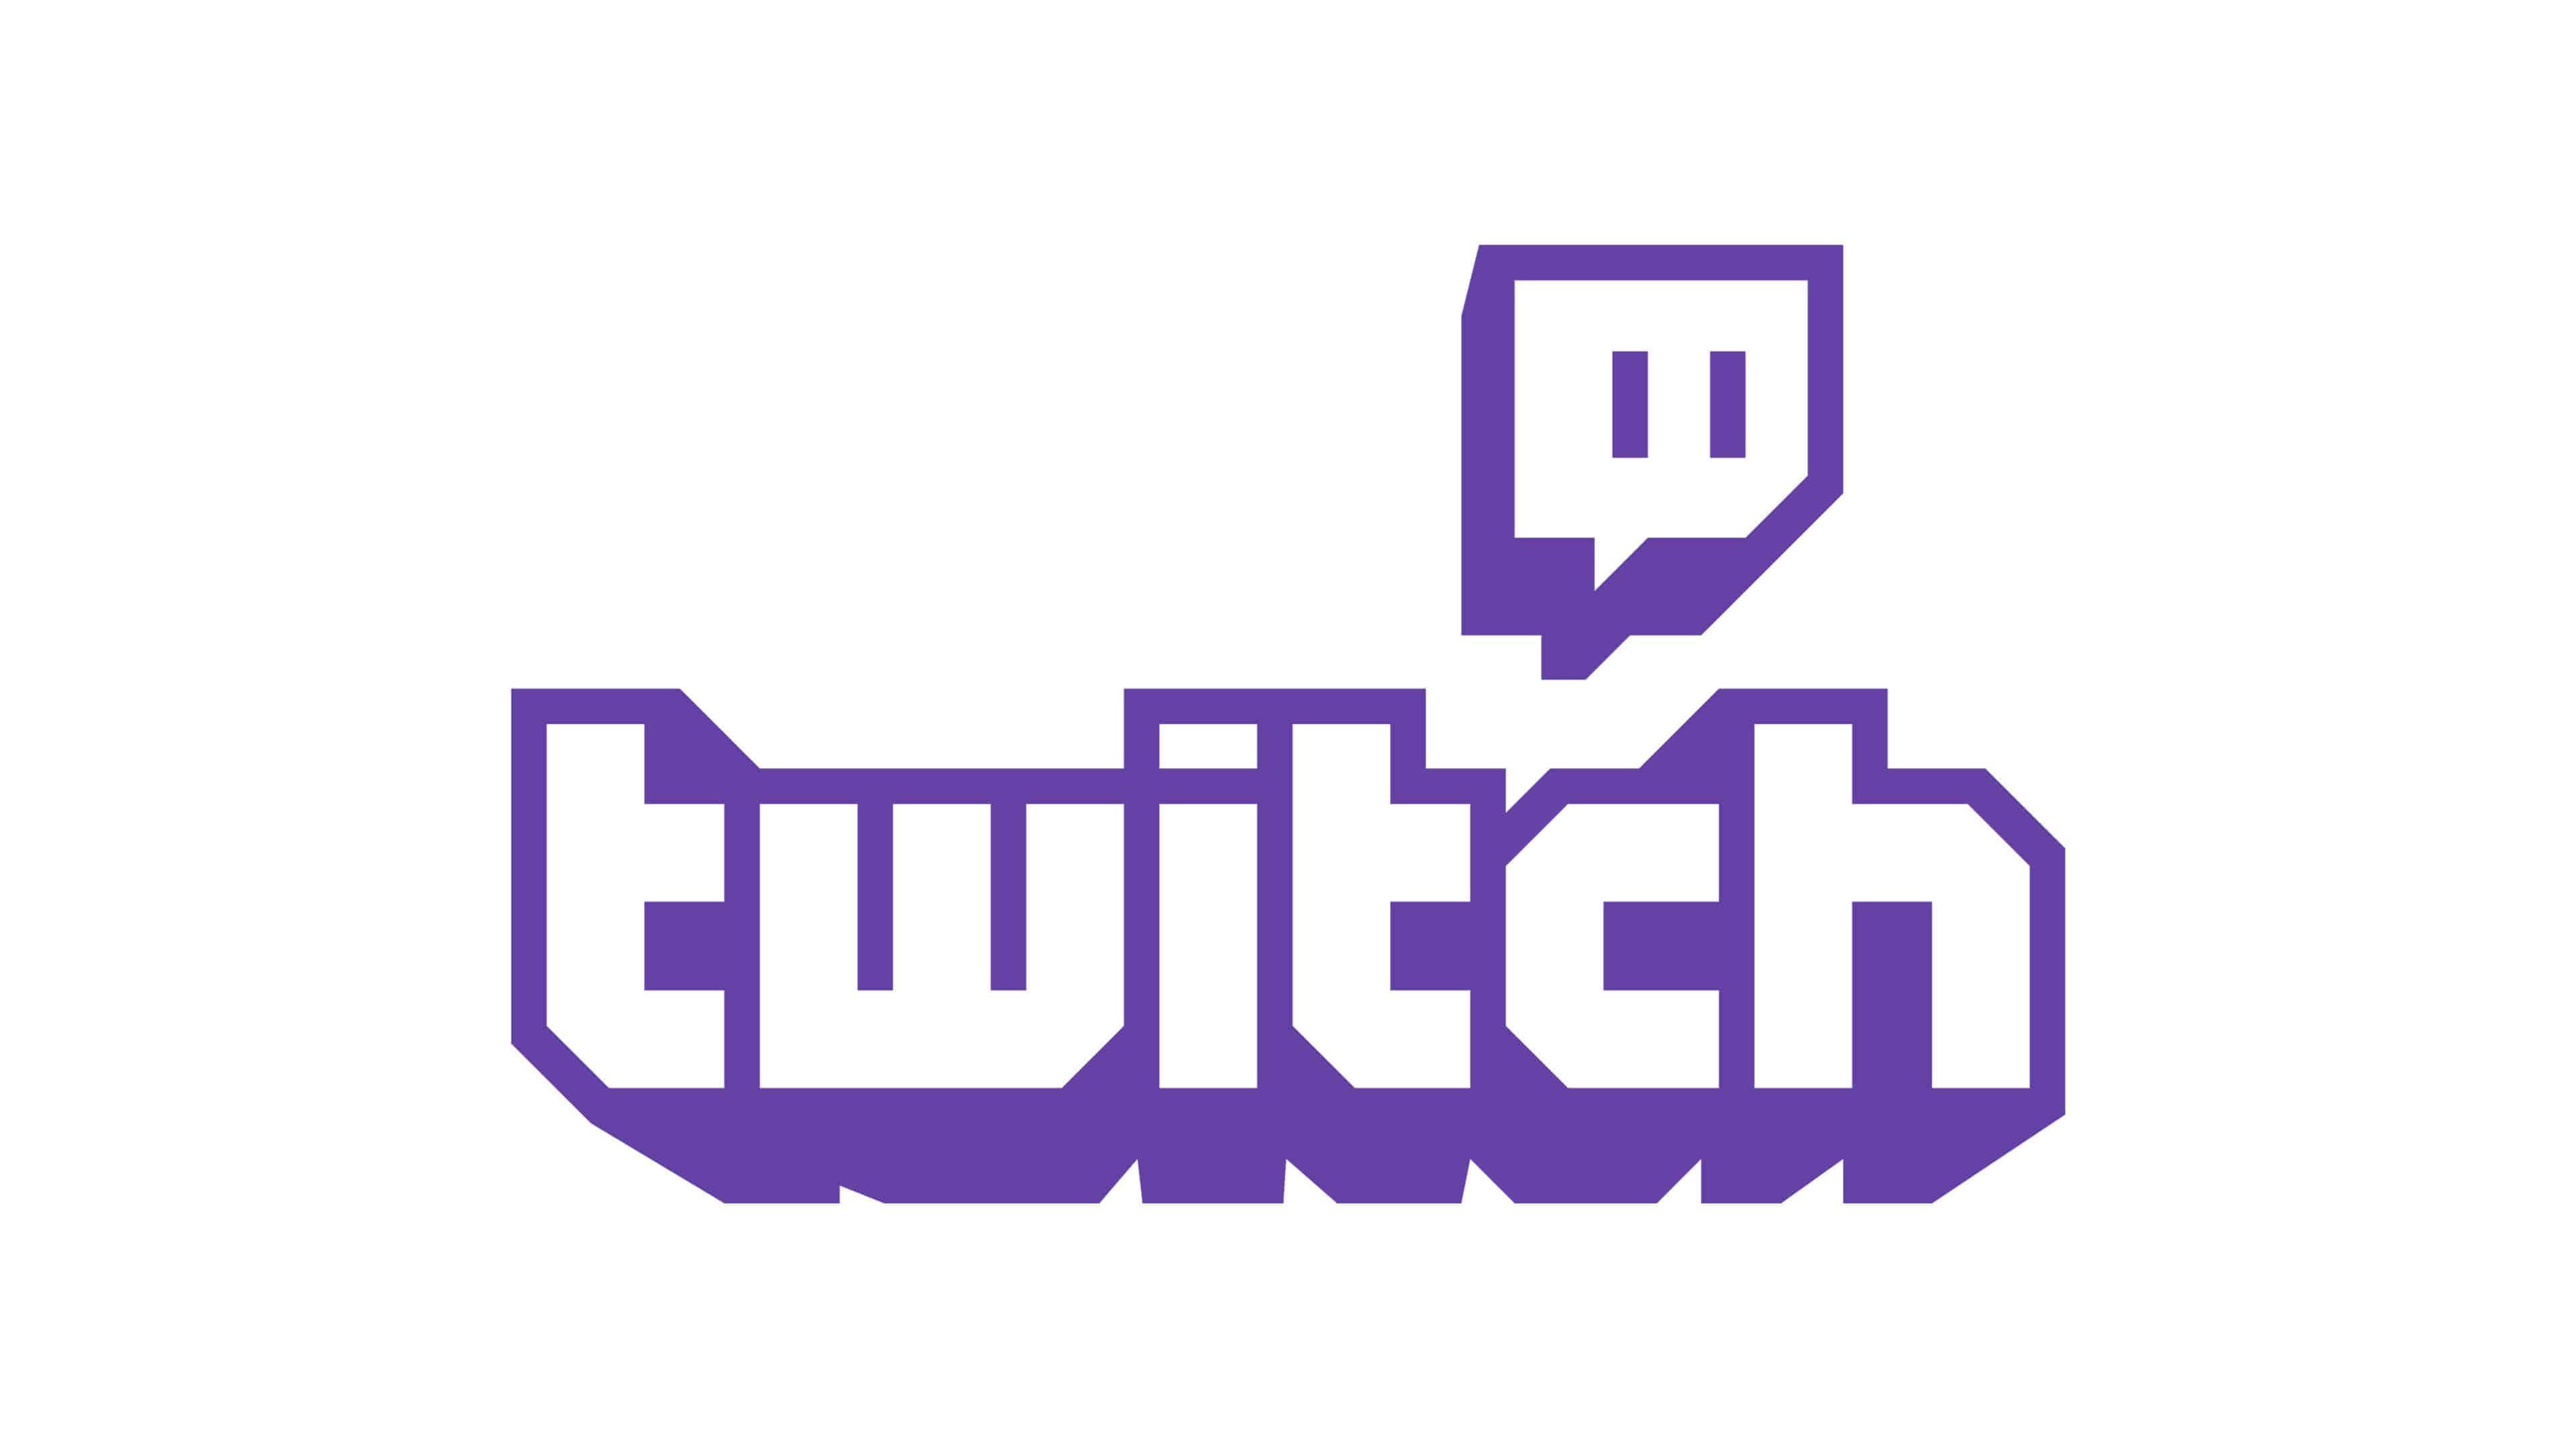 twitch logo uhd 4k wallpaper